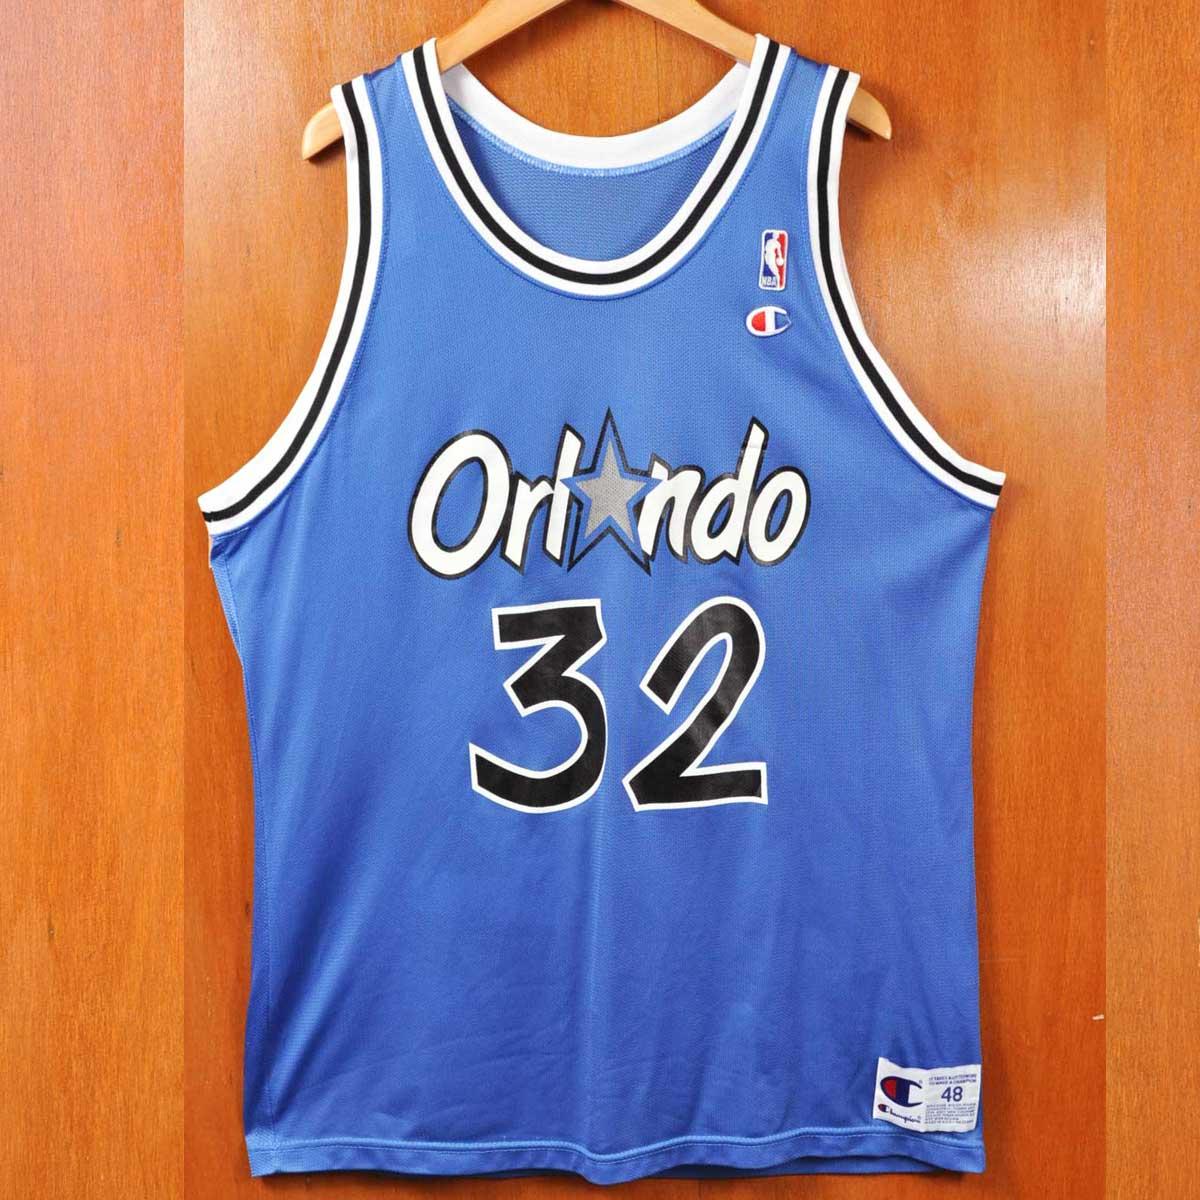 e55ba2197 CHAMPION champion   NBA ORLANDO MAGIC Orlando Magic   Shaquille O Neal    basketball tank top uniform numbering   blue   men XL equivalency in the  vintage ...